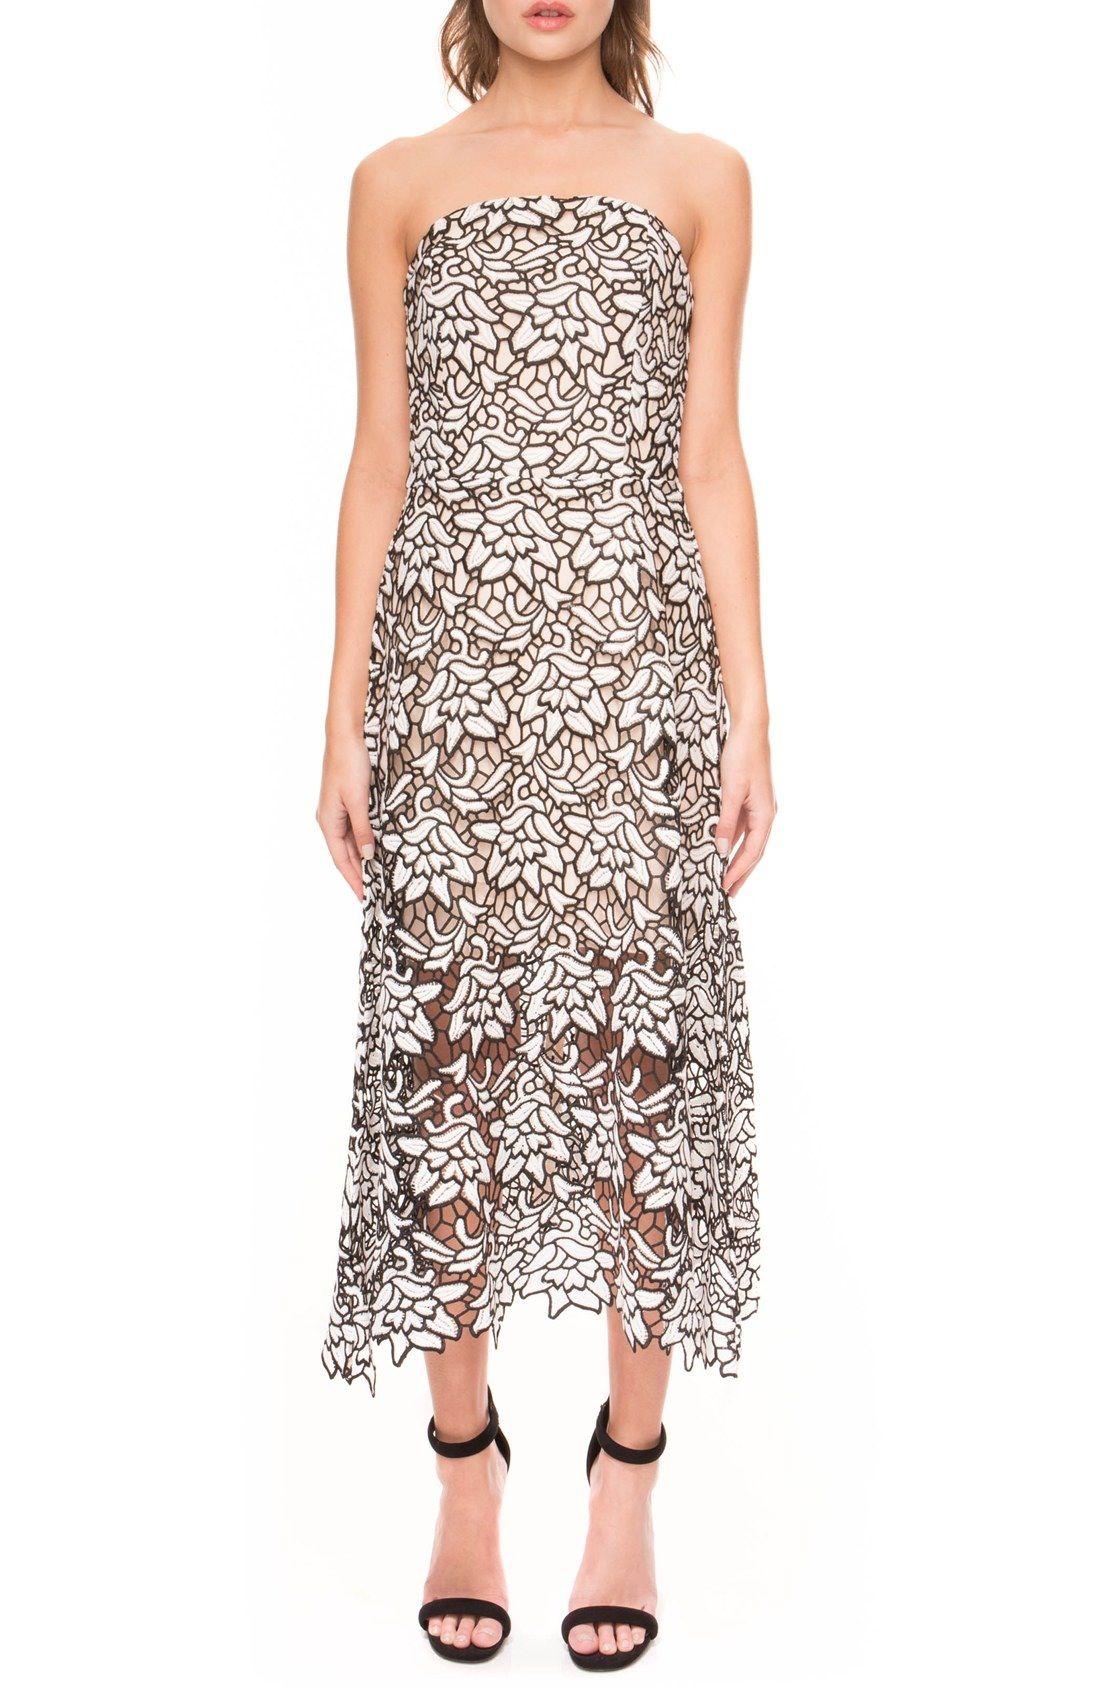 Keepsake The Label True Love Strapless Lace Dress Nordstrom Strapless Lace Dress Sheer Lace Dress Cocktail Dress Lace [ 1687 x 1100 Pixel ]